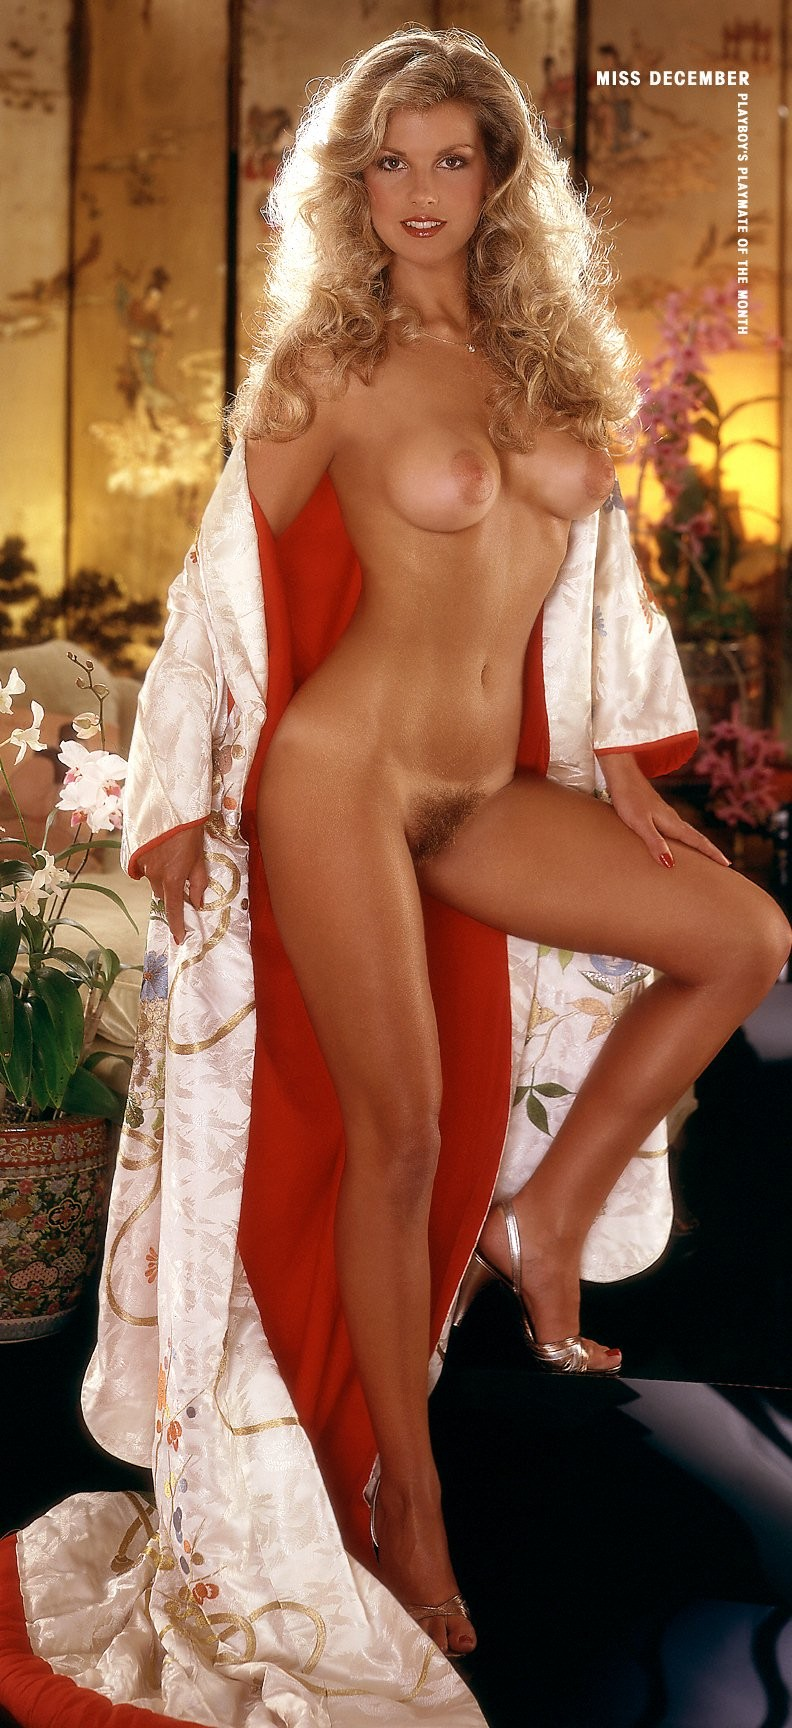 Beautiful blonde sara underwood sexy nude photoshoot - 2 part 1